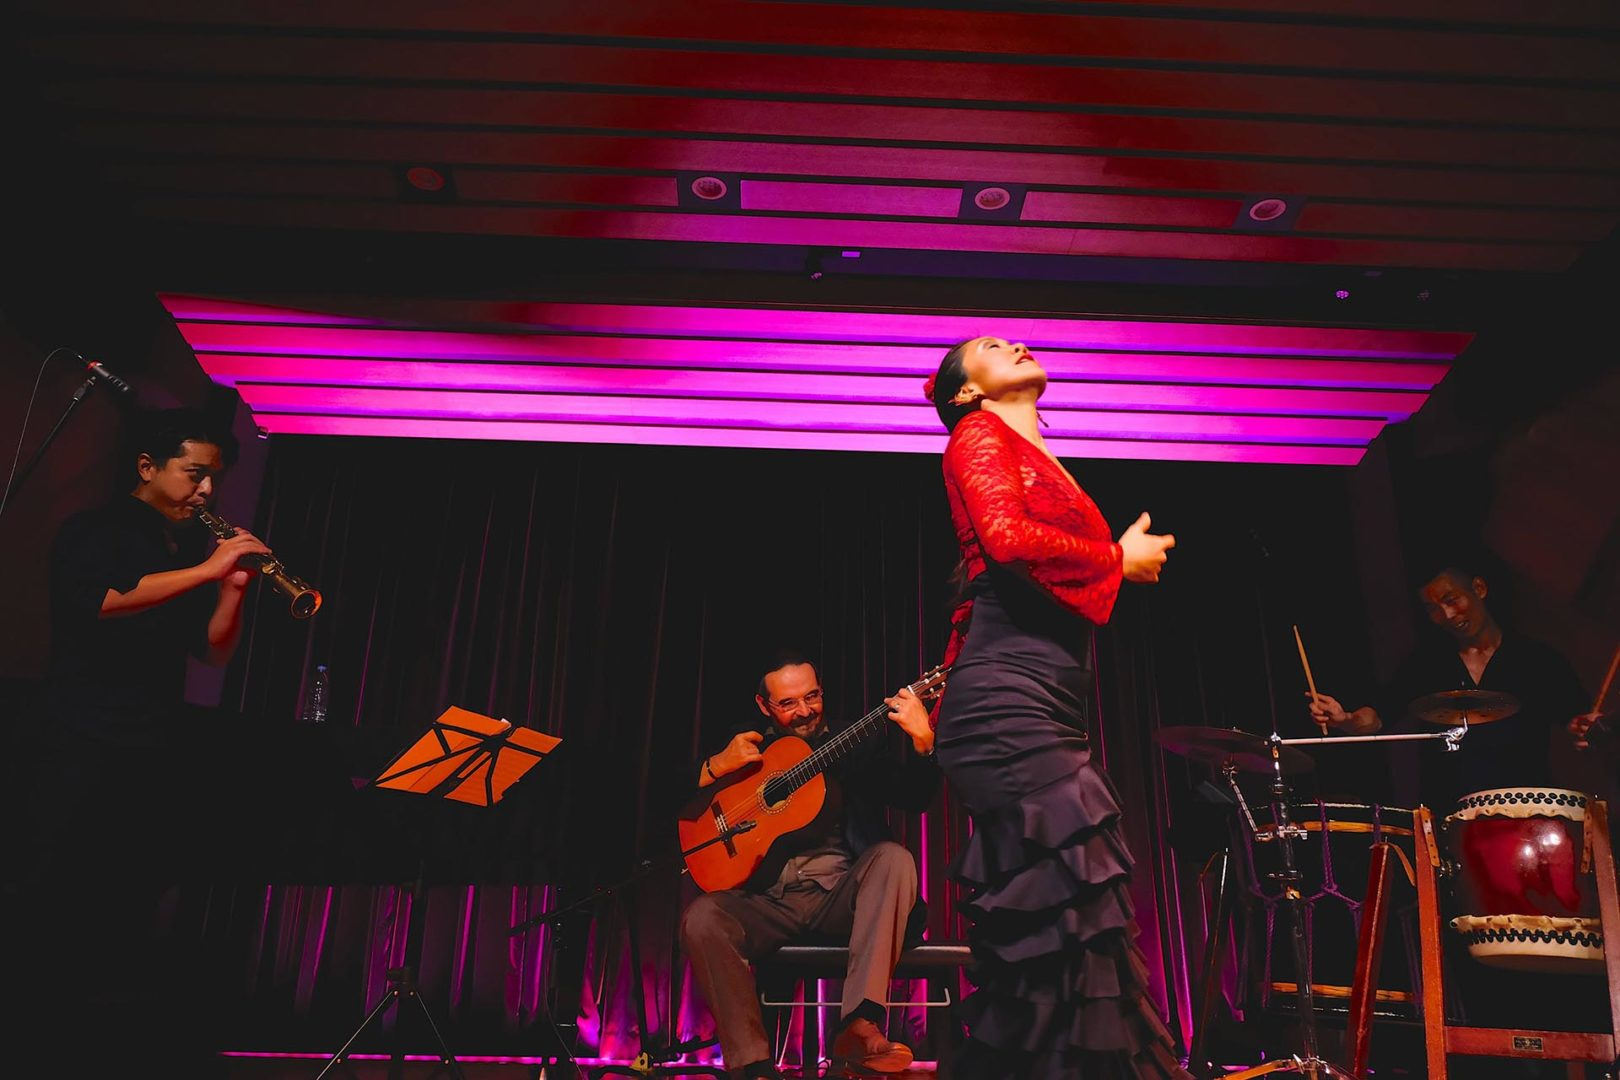 Masaki Otawa 大多和正樹 (Japanese taiko player - 和太鼓奏者) [Flamenco Jazz Japan_2018_2] Ricardo Garcia, Yuichiro Tokuda, Nanako Aramaki